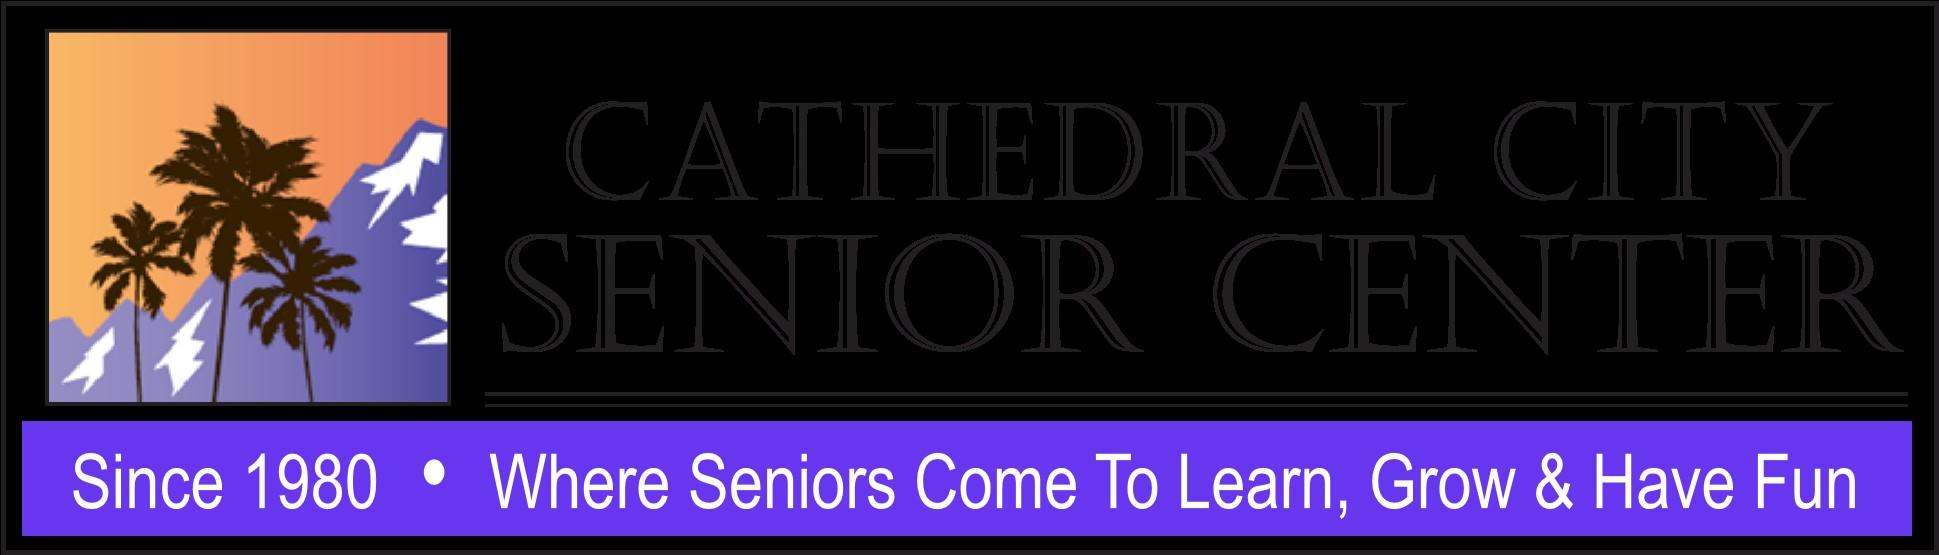 Cathedral City Senior Center logo 2017